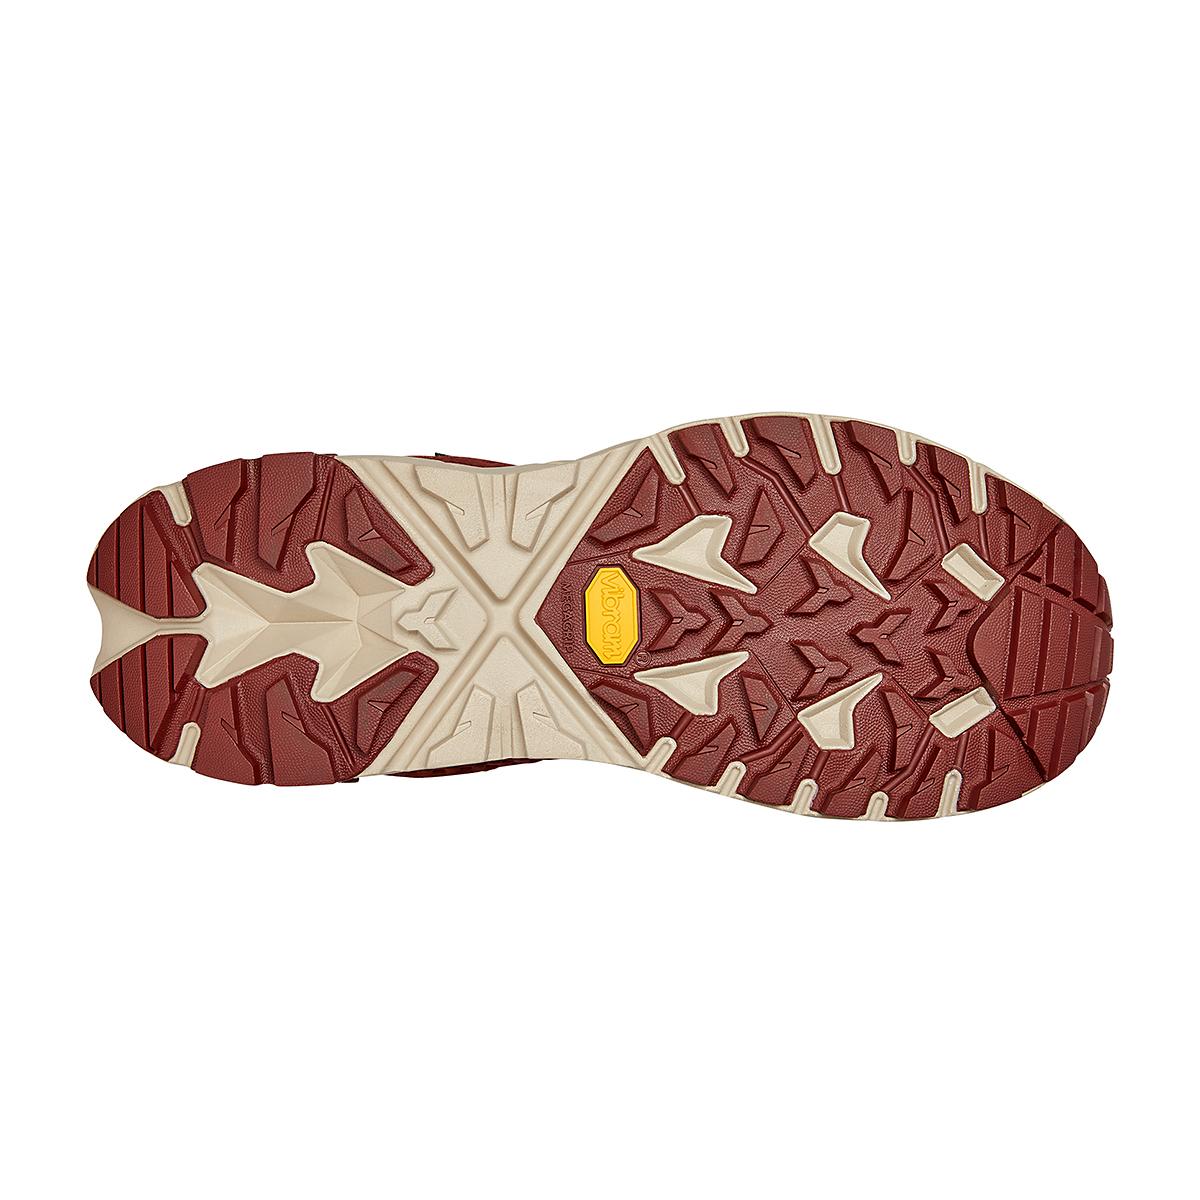 Women's Hoka One One Anacapa Low Gore-Tex Trail Running Shoe - Color: Cherry Mahogany - Size: 5 - Width: Regular, Cherry Mahogany, large, image 6